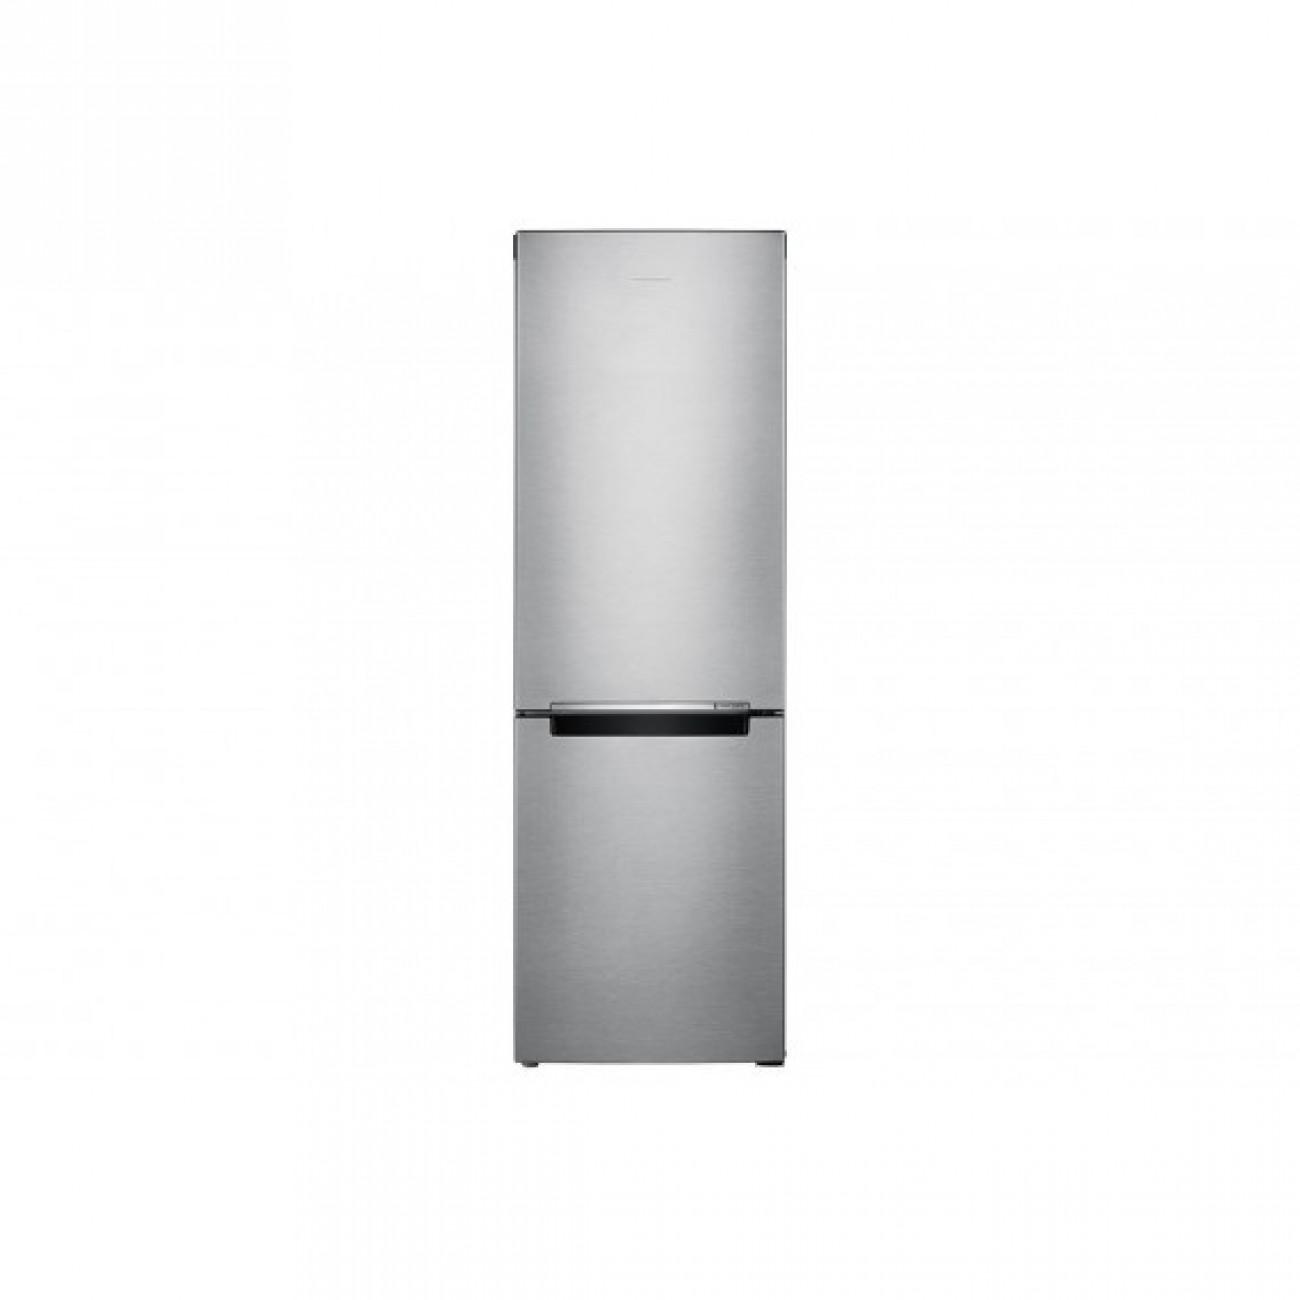 Хладилник с фризер Samsung RB31HSR2DSA/EF в Хладилници с фризери - Samsung | Alleop